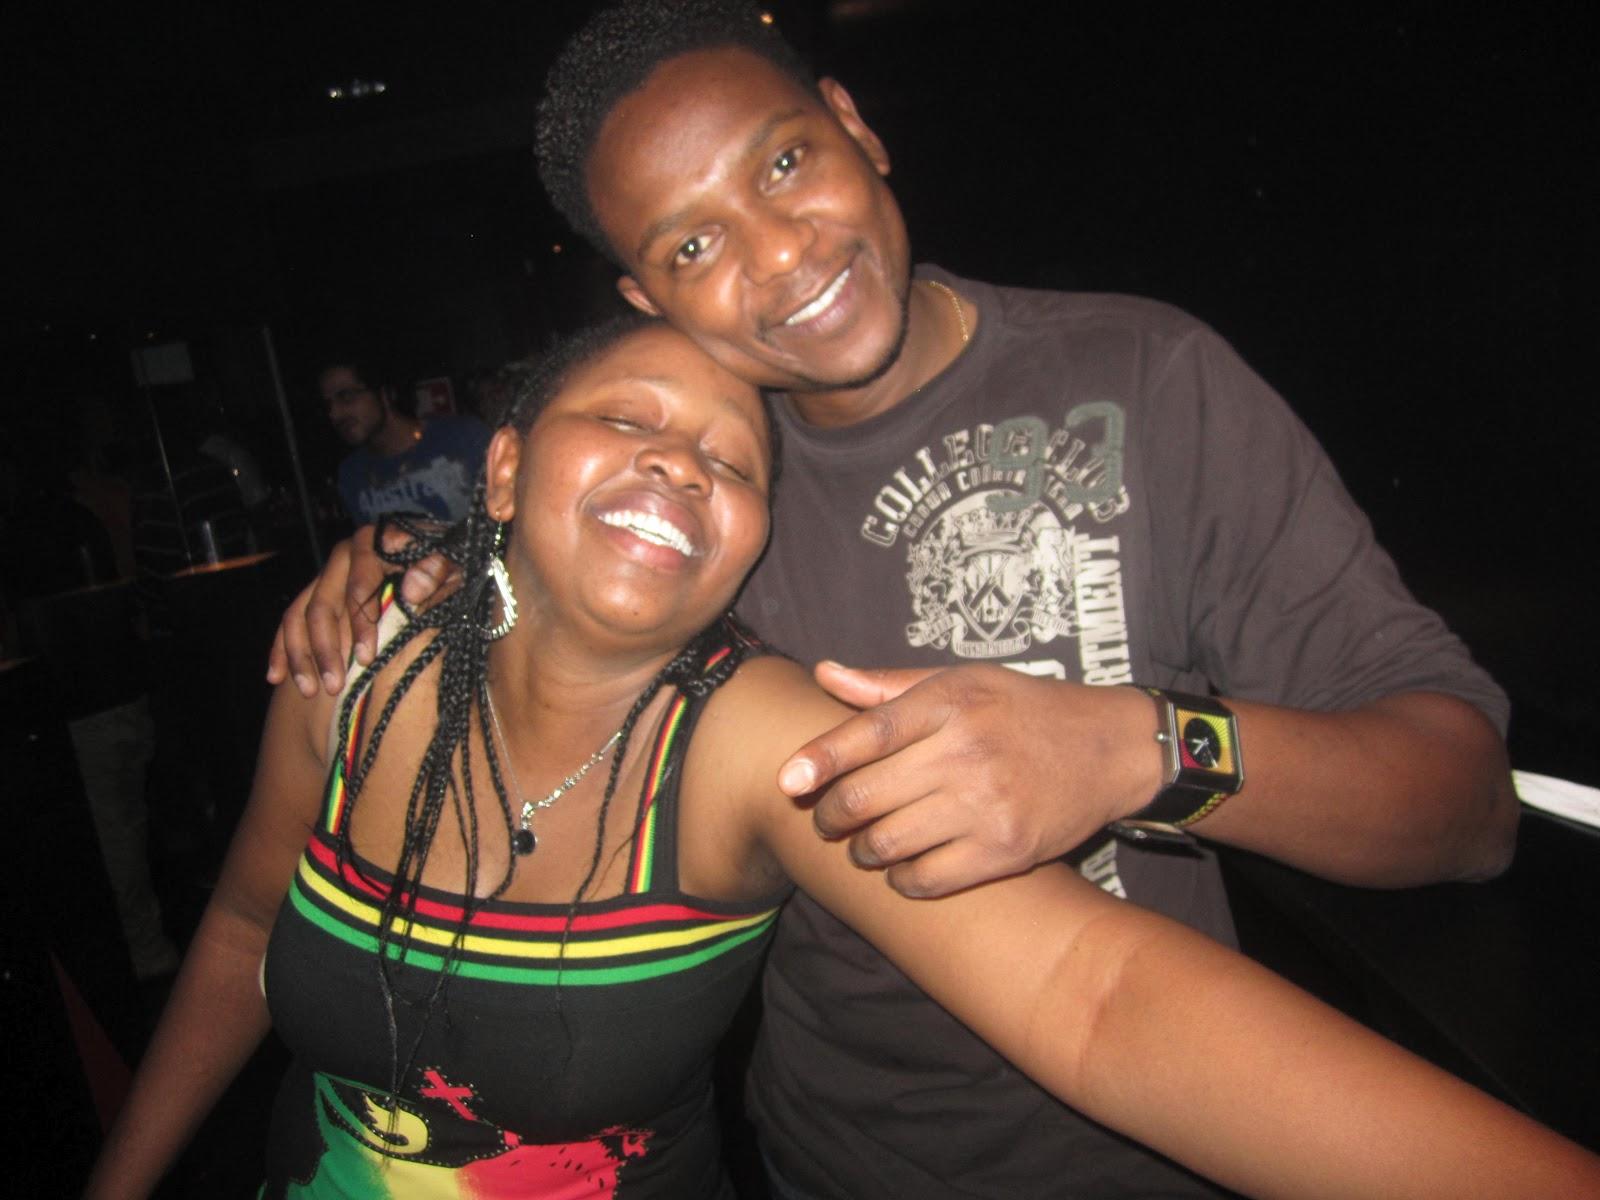 Aliyetonesha kidonda:Simon Kitururu Muda: Thursday, August 23, 2012